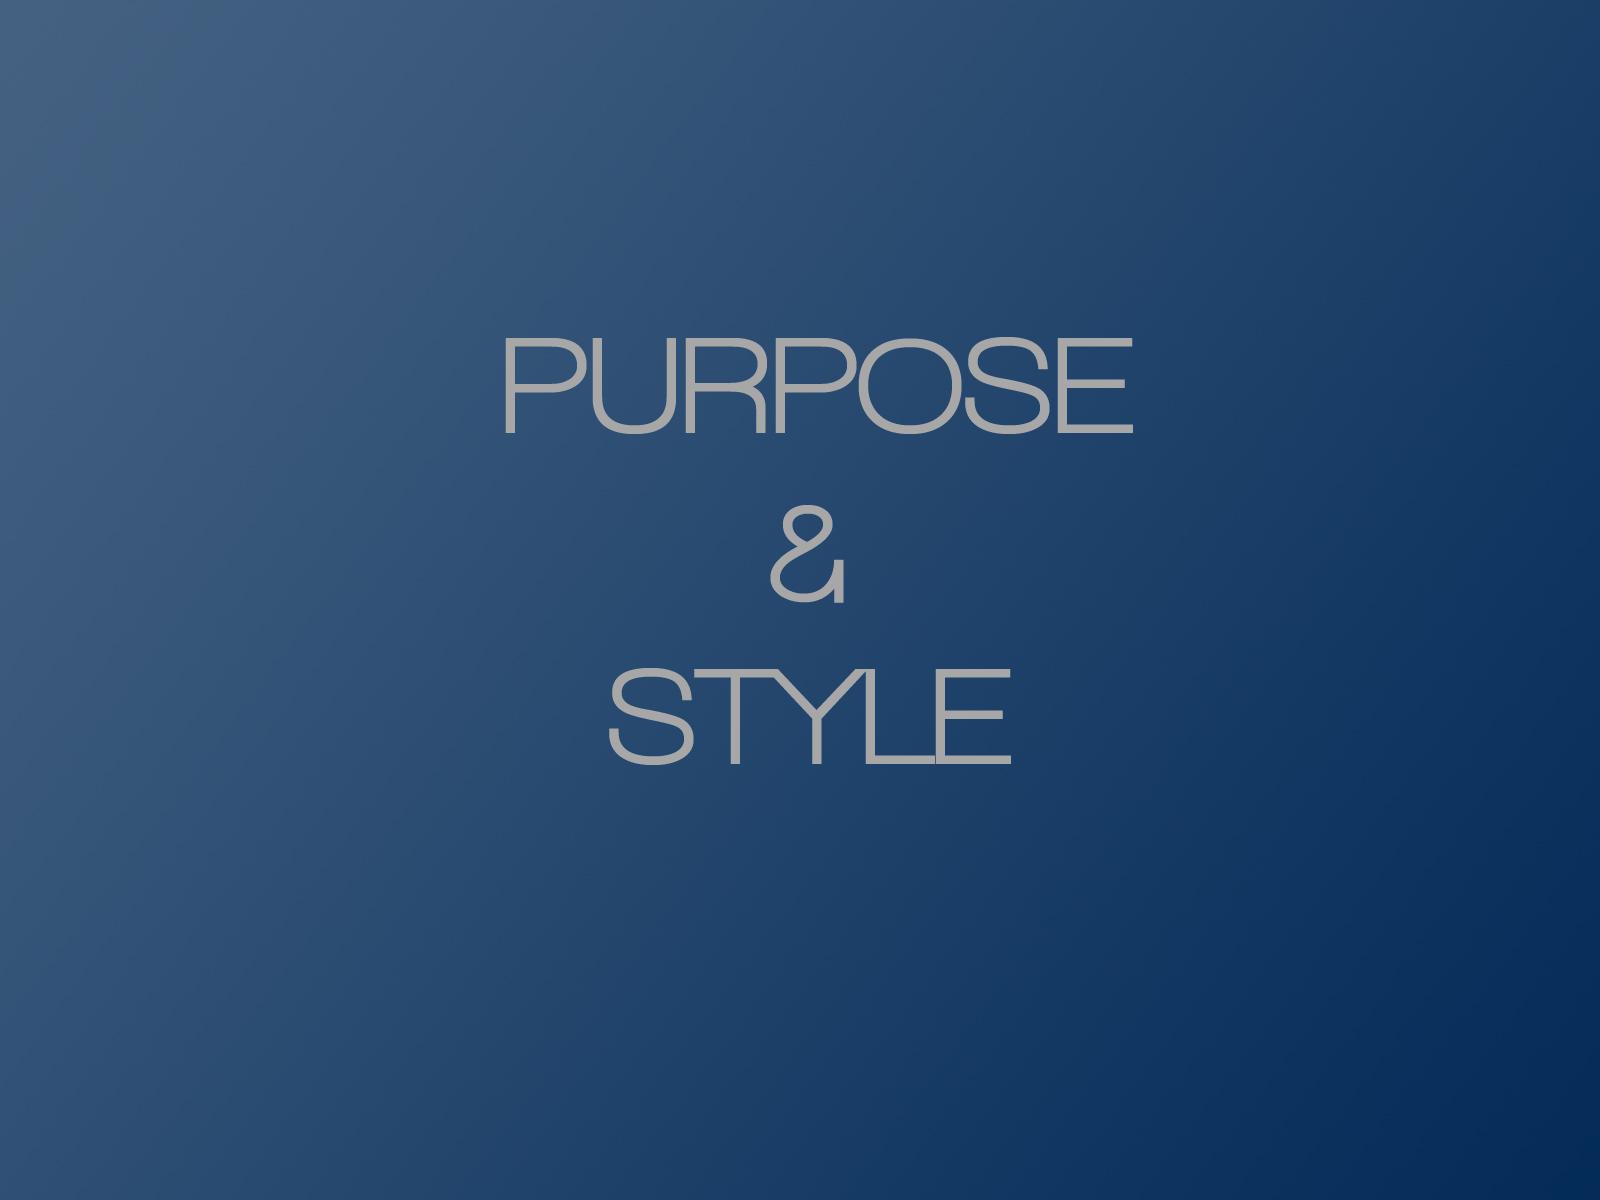 PowerPoint Design – 2 – Purpose